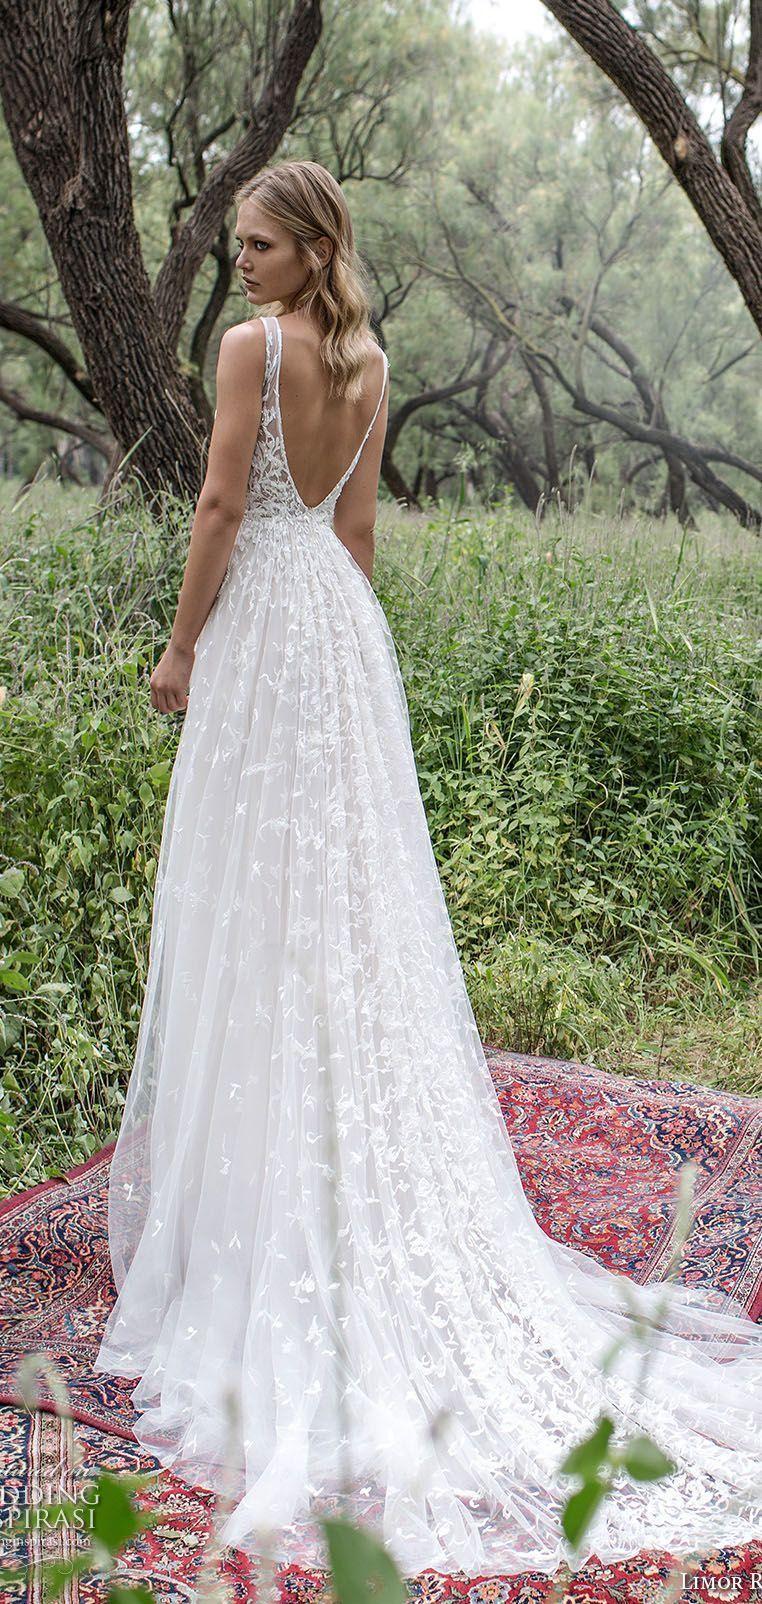 Bodice illusion open back sheer deep v neck sleeveless wedding